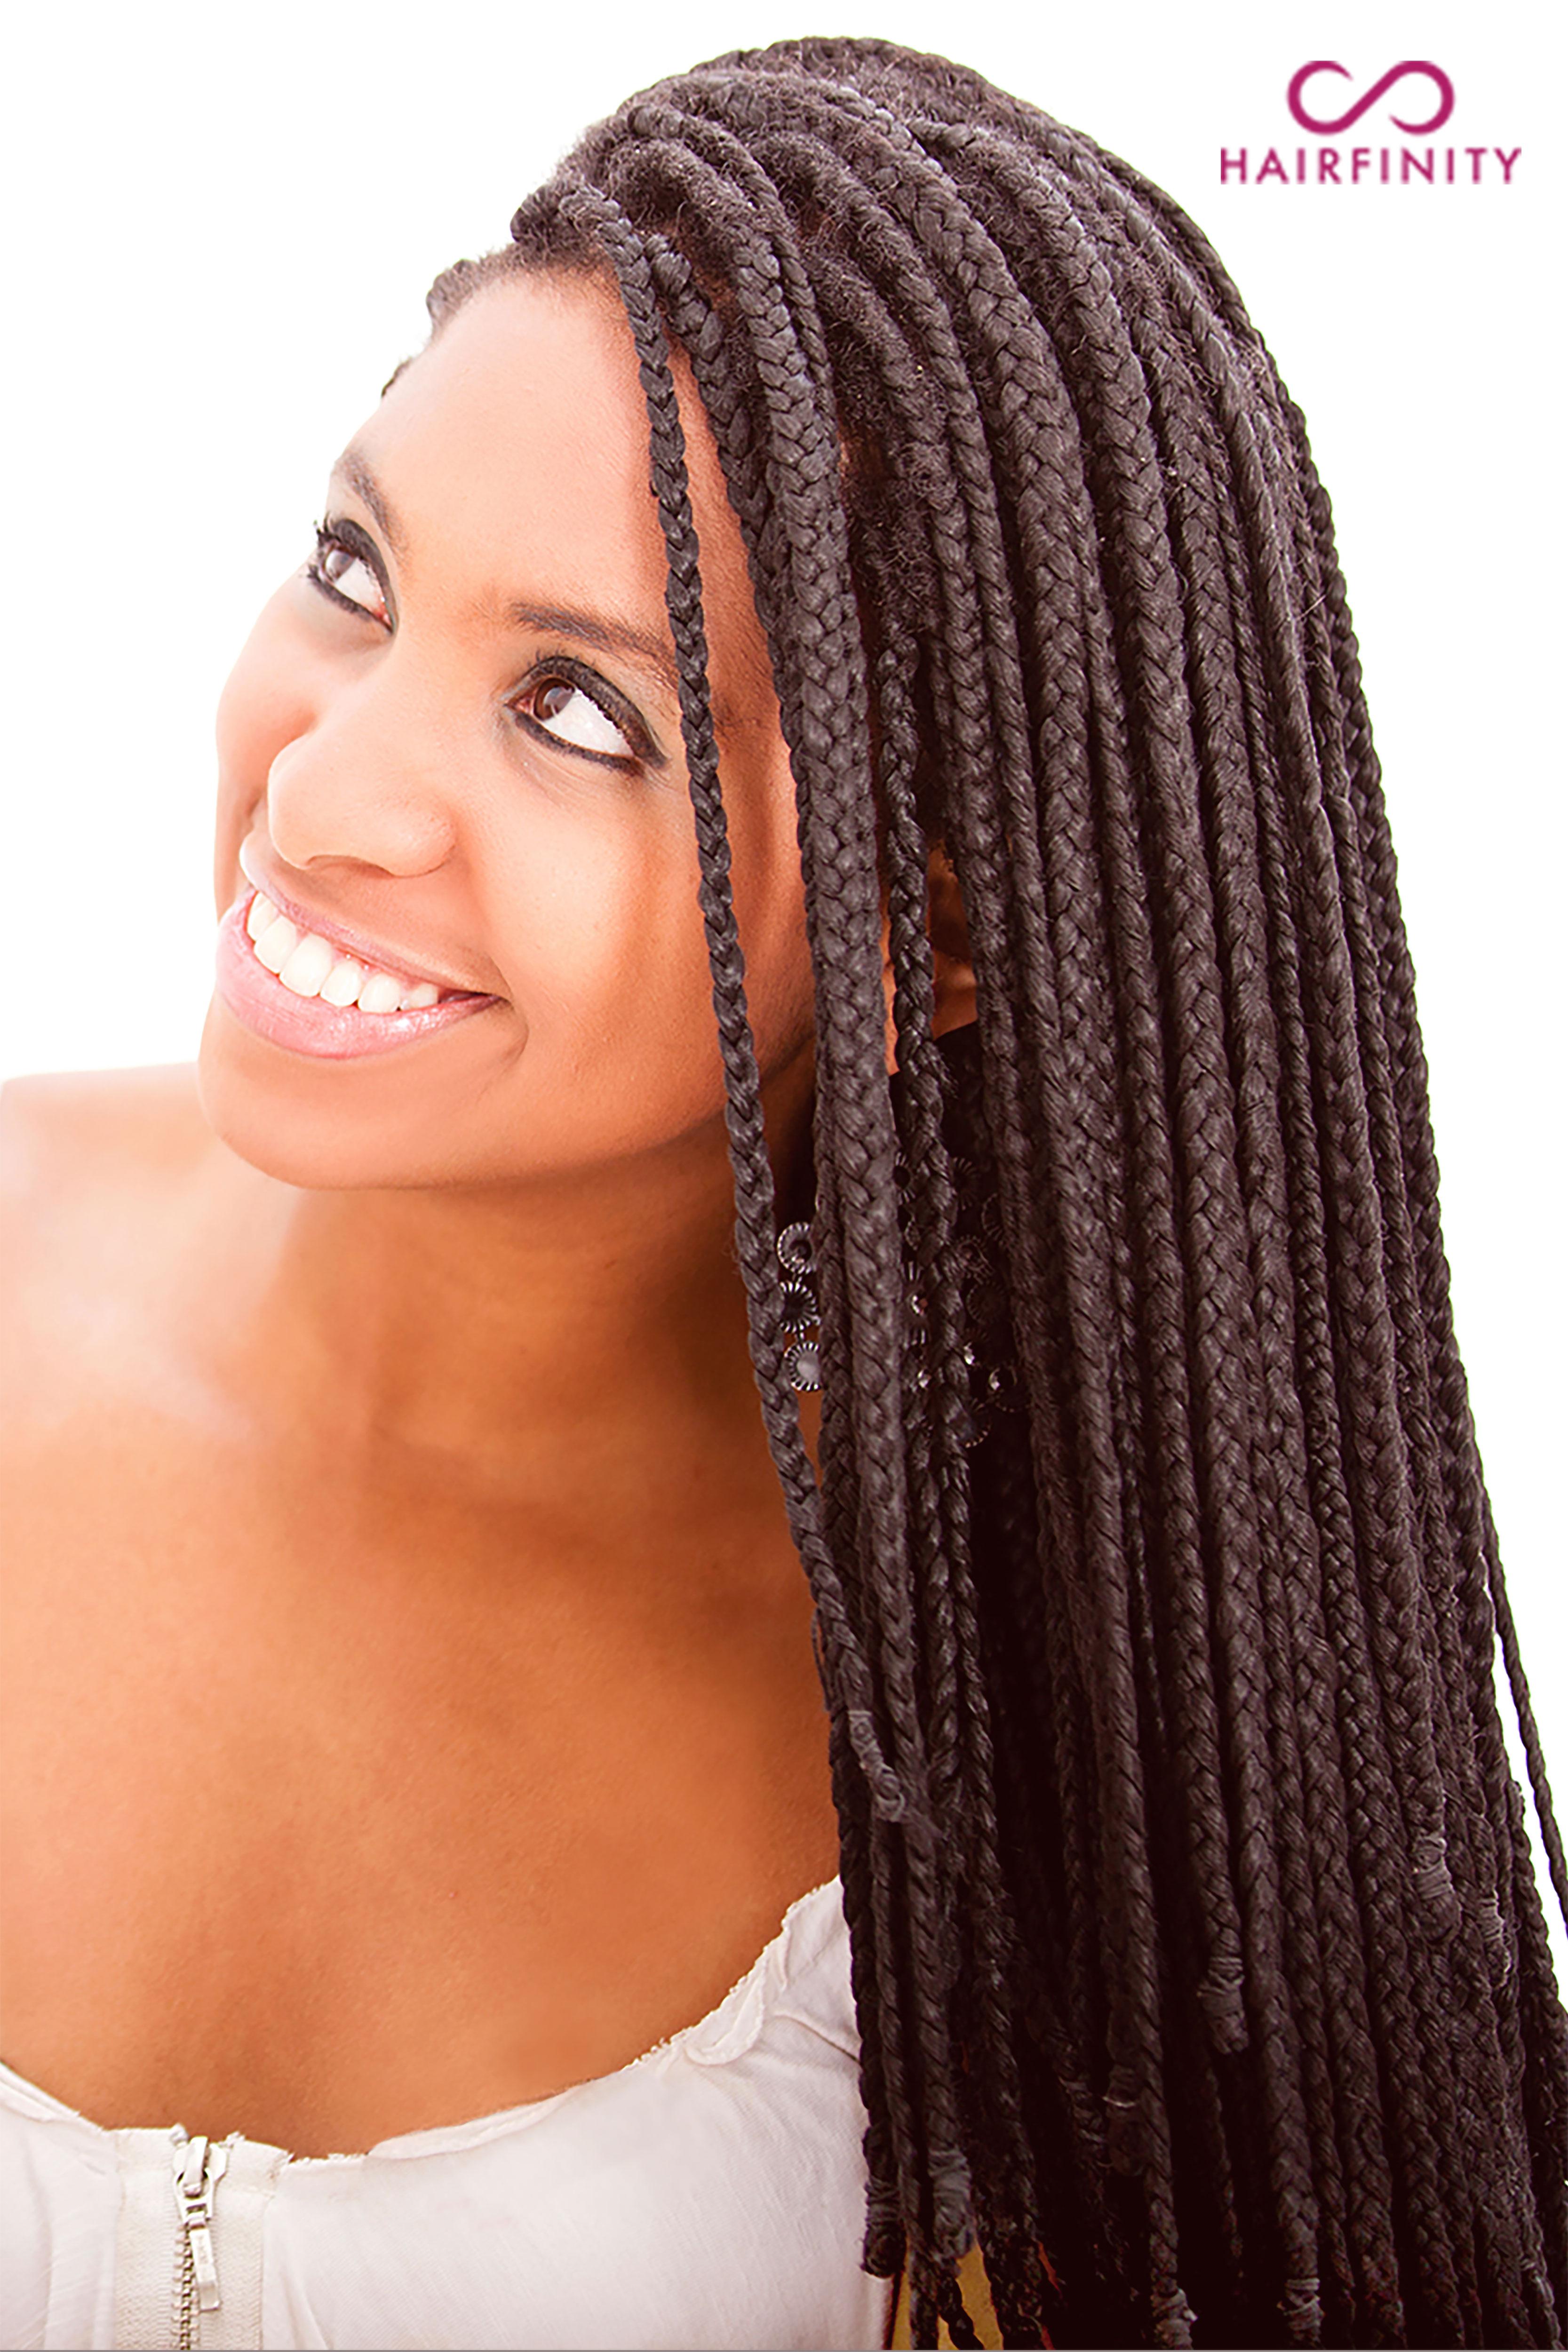 Hairfinity United States Blog | Protective Styles: Harm